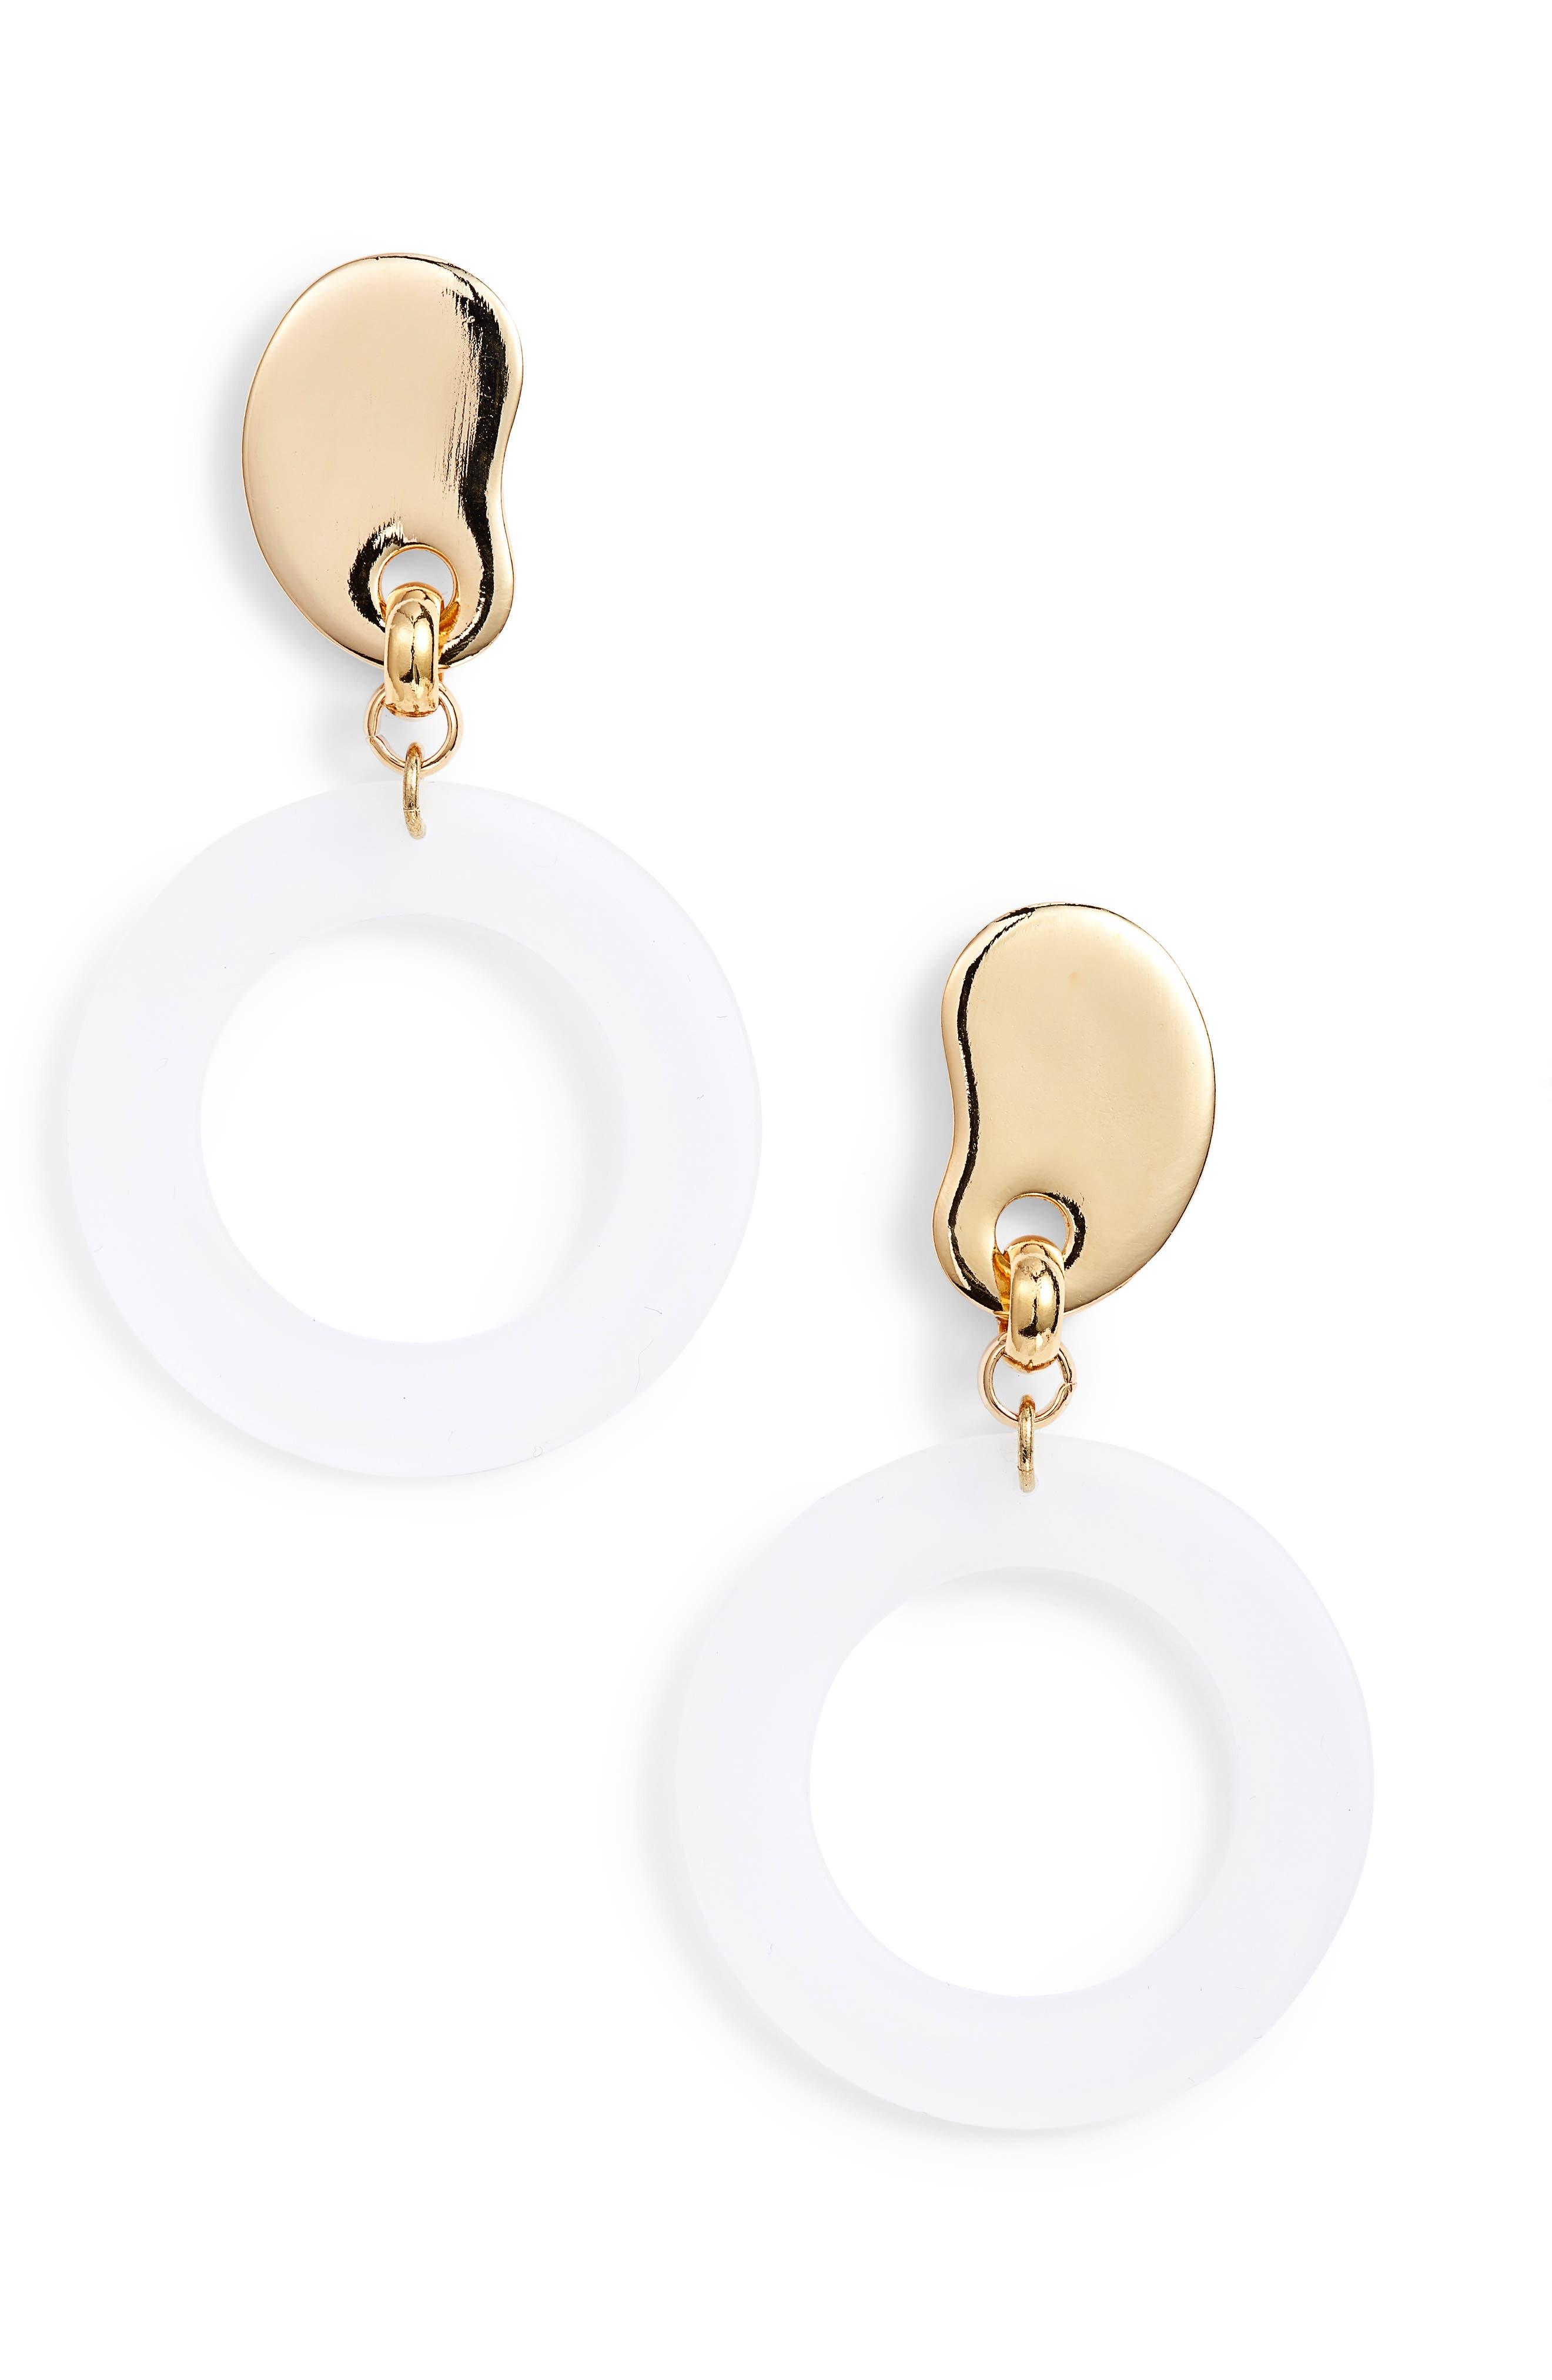 BIKO Amoeba Lucite® Hoop Earrings